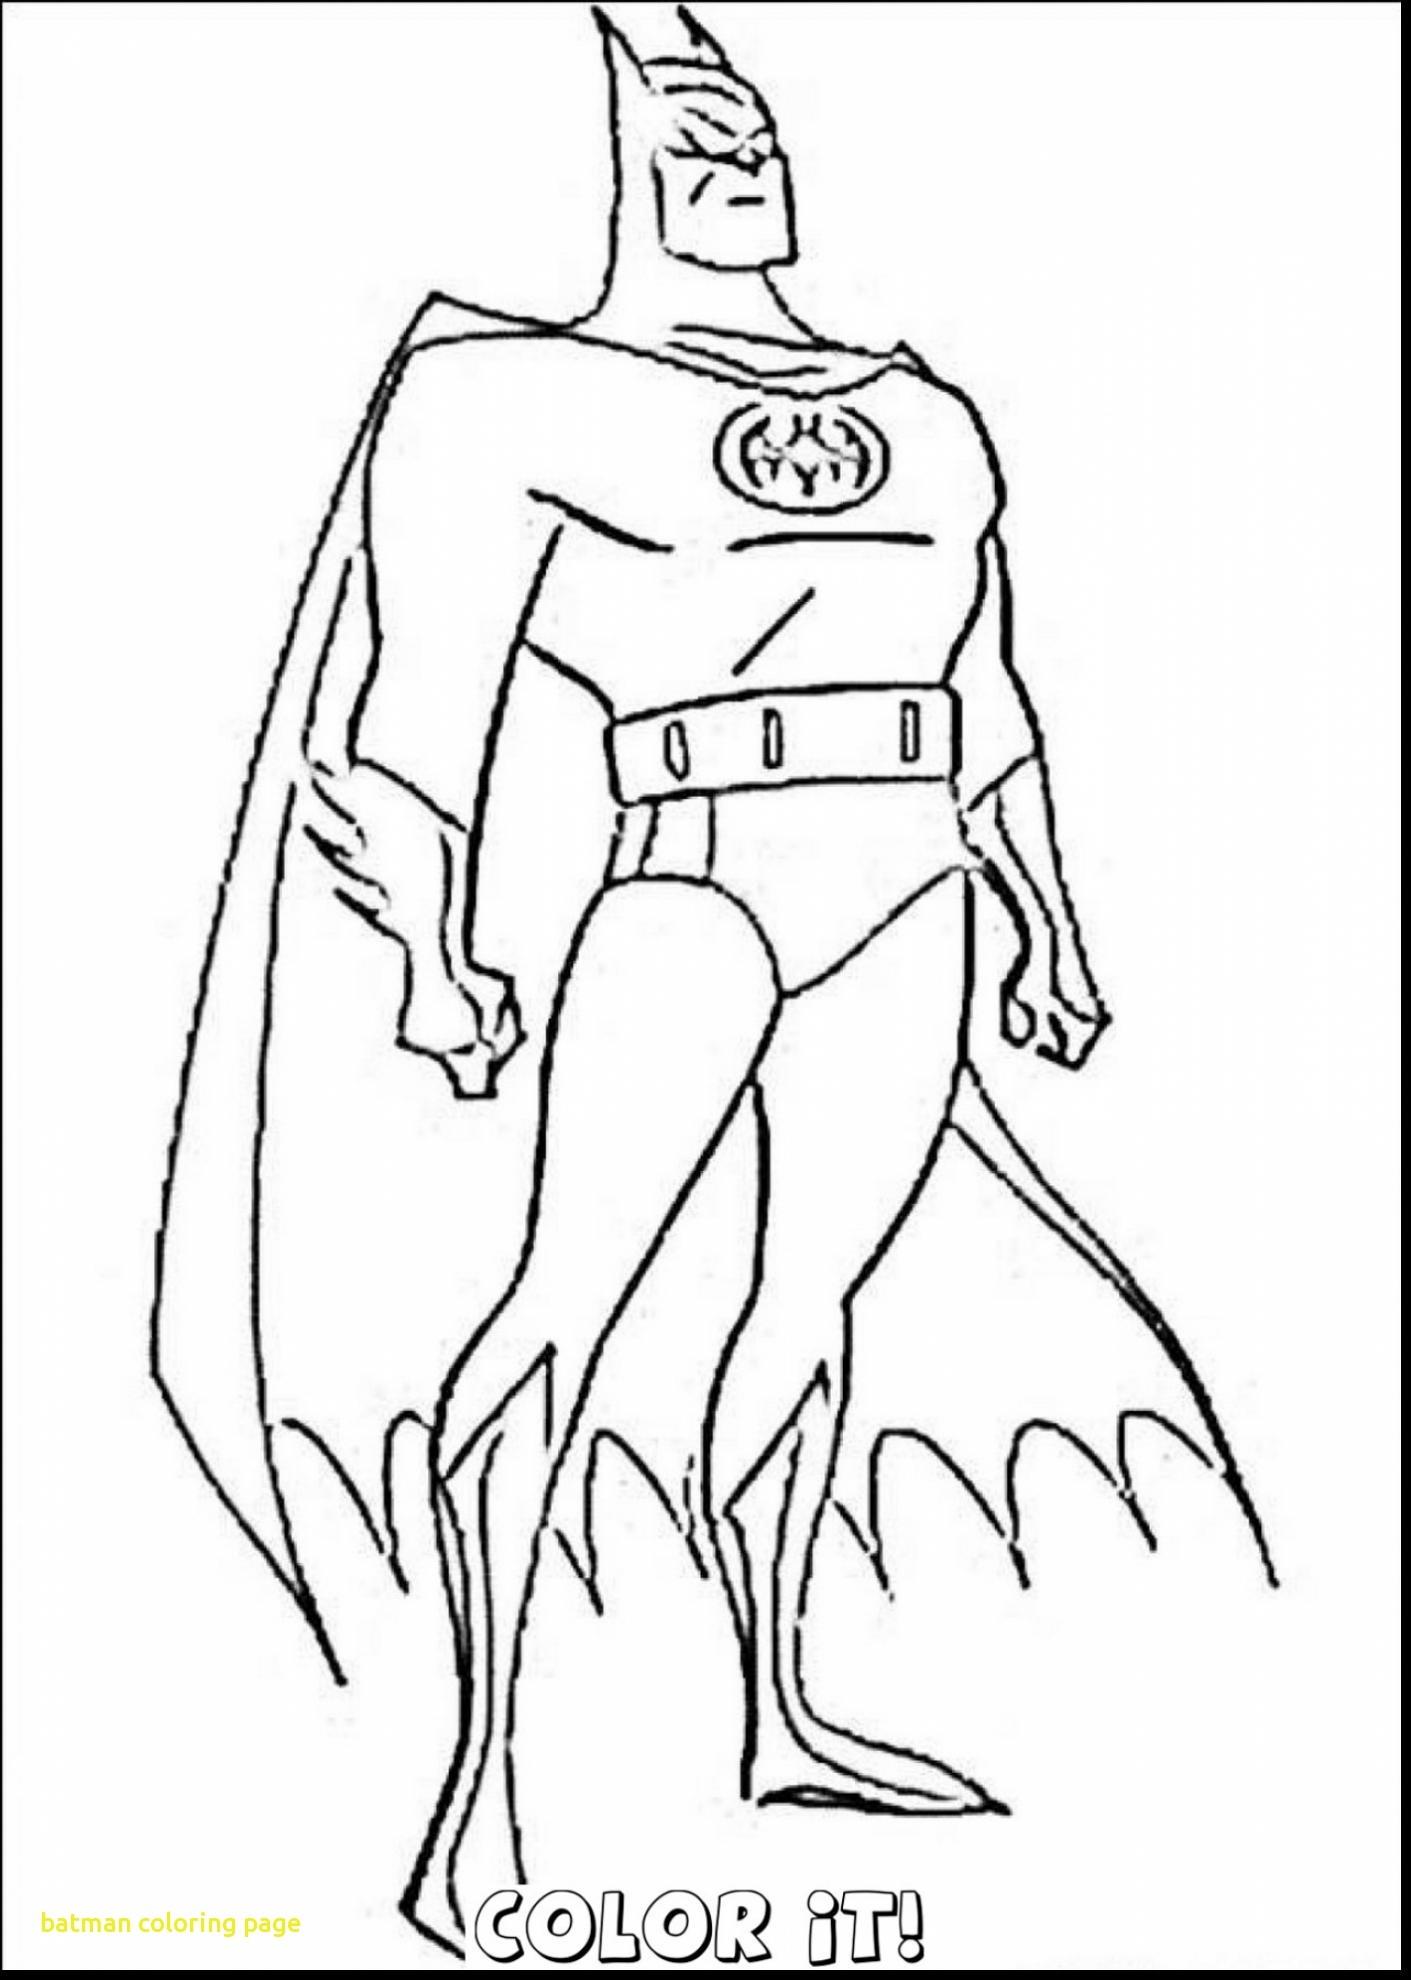 Coloring Page: Batman Coloring Pages Printable To Print Free - Free Printable Batman Coloring Pages